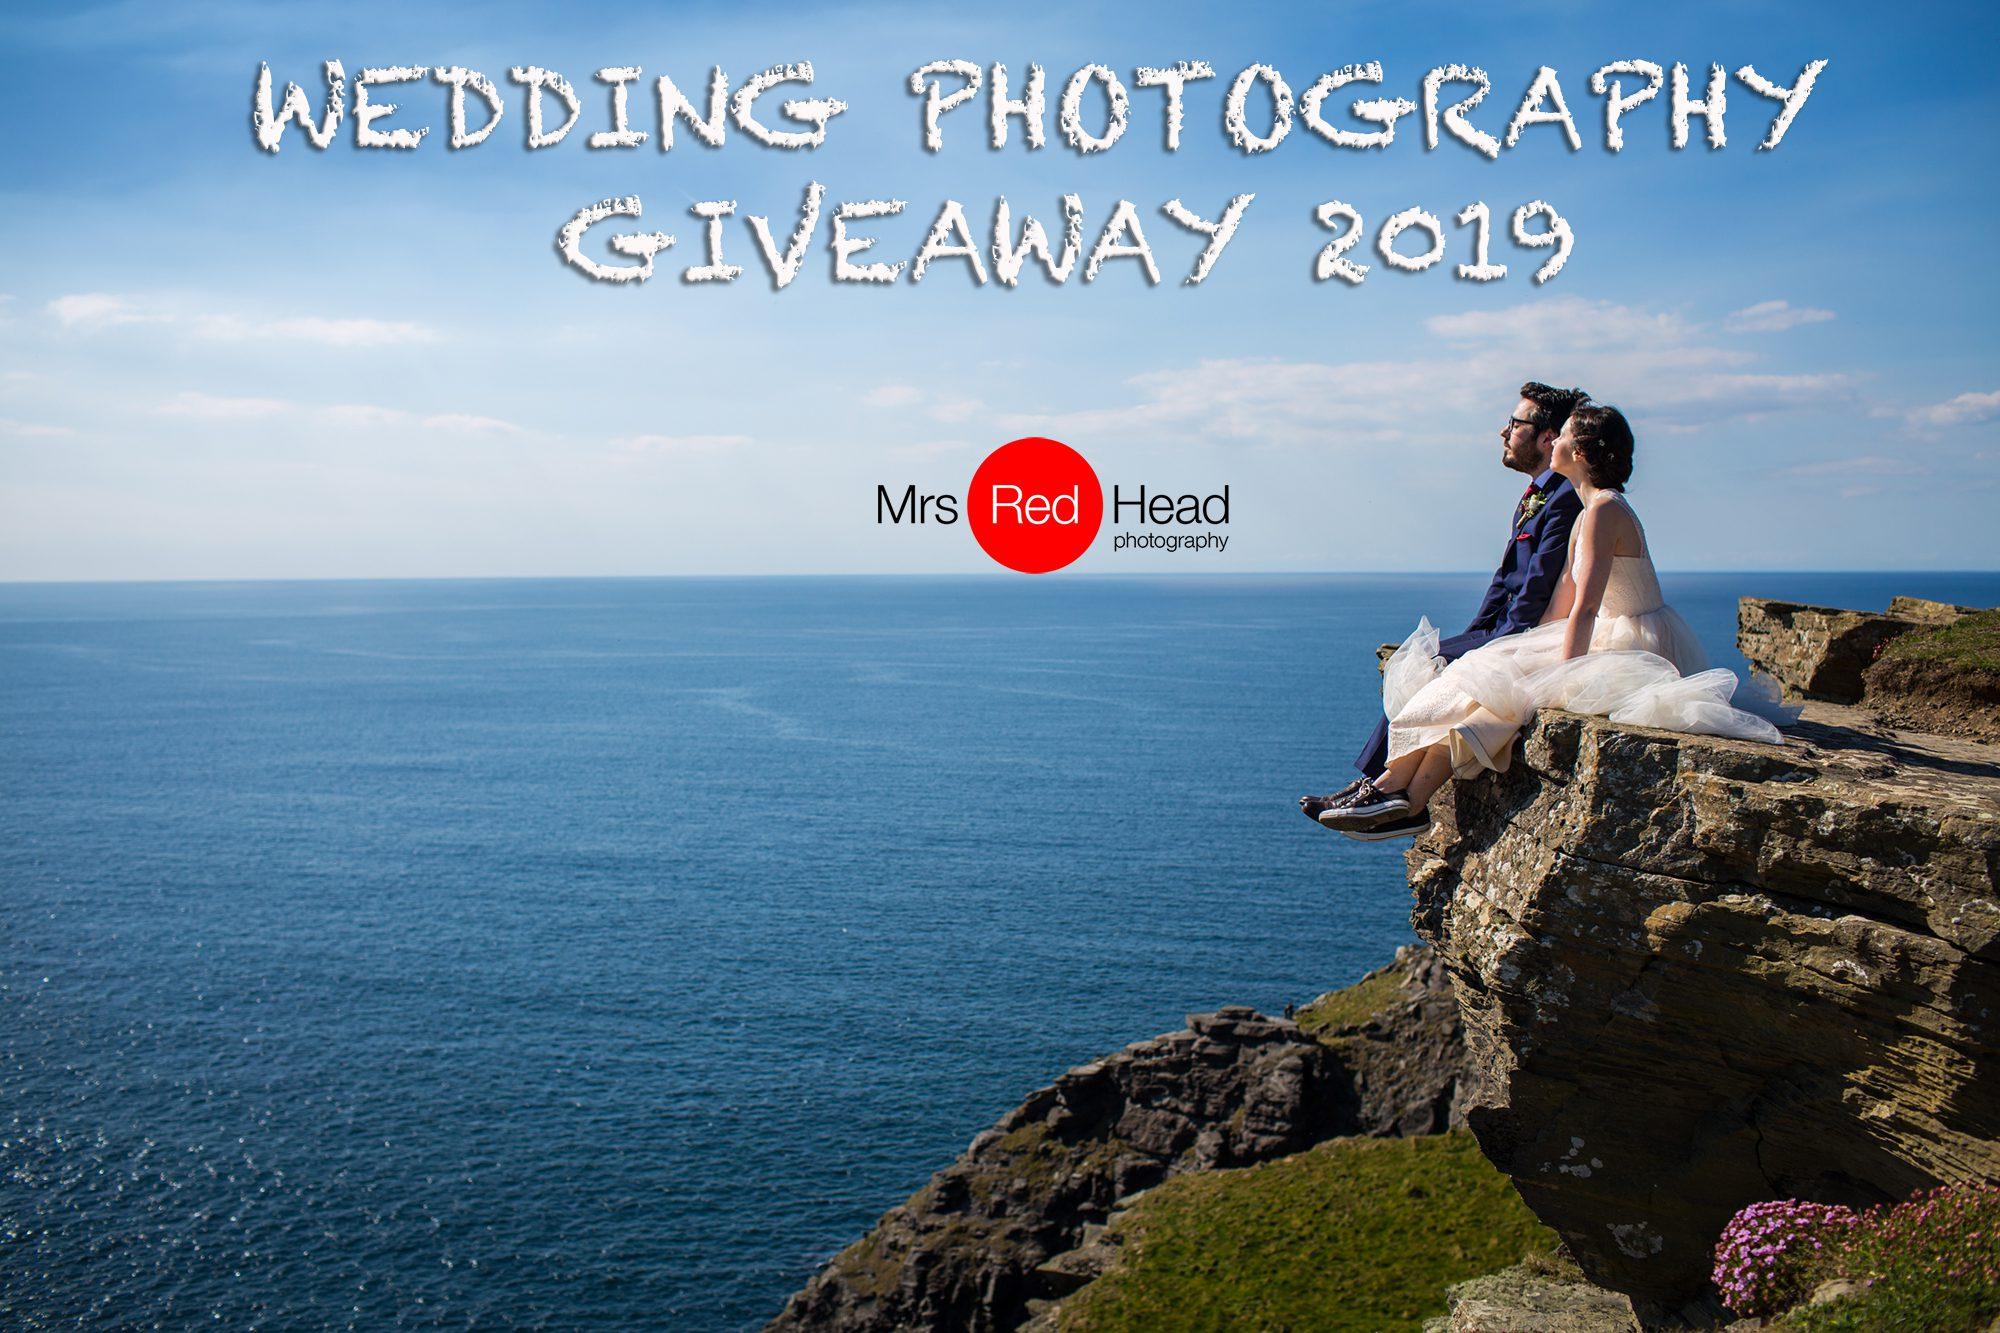 MrsRedhead Wedding Photography Ireland Giveaway 2019